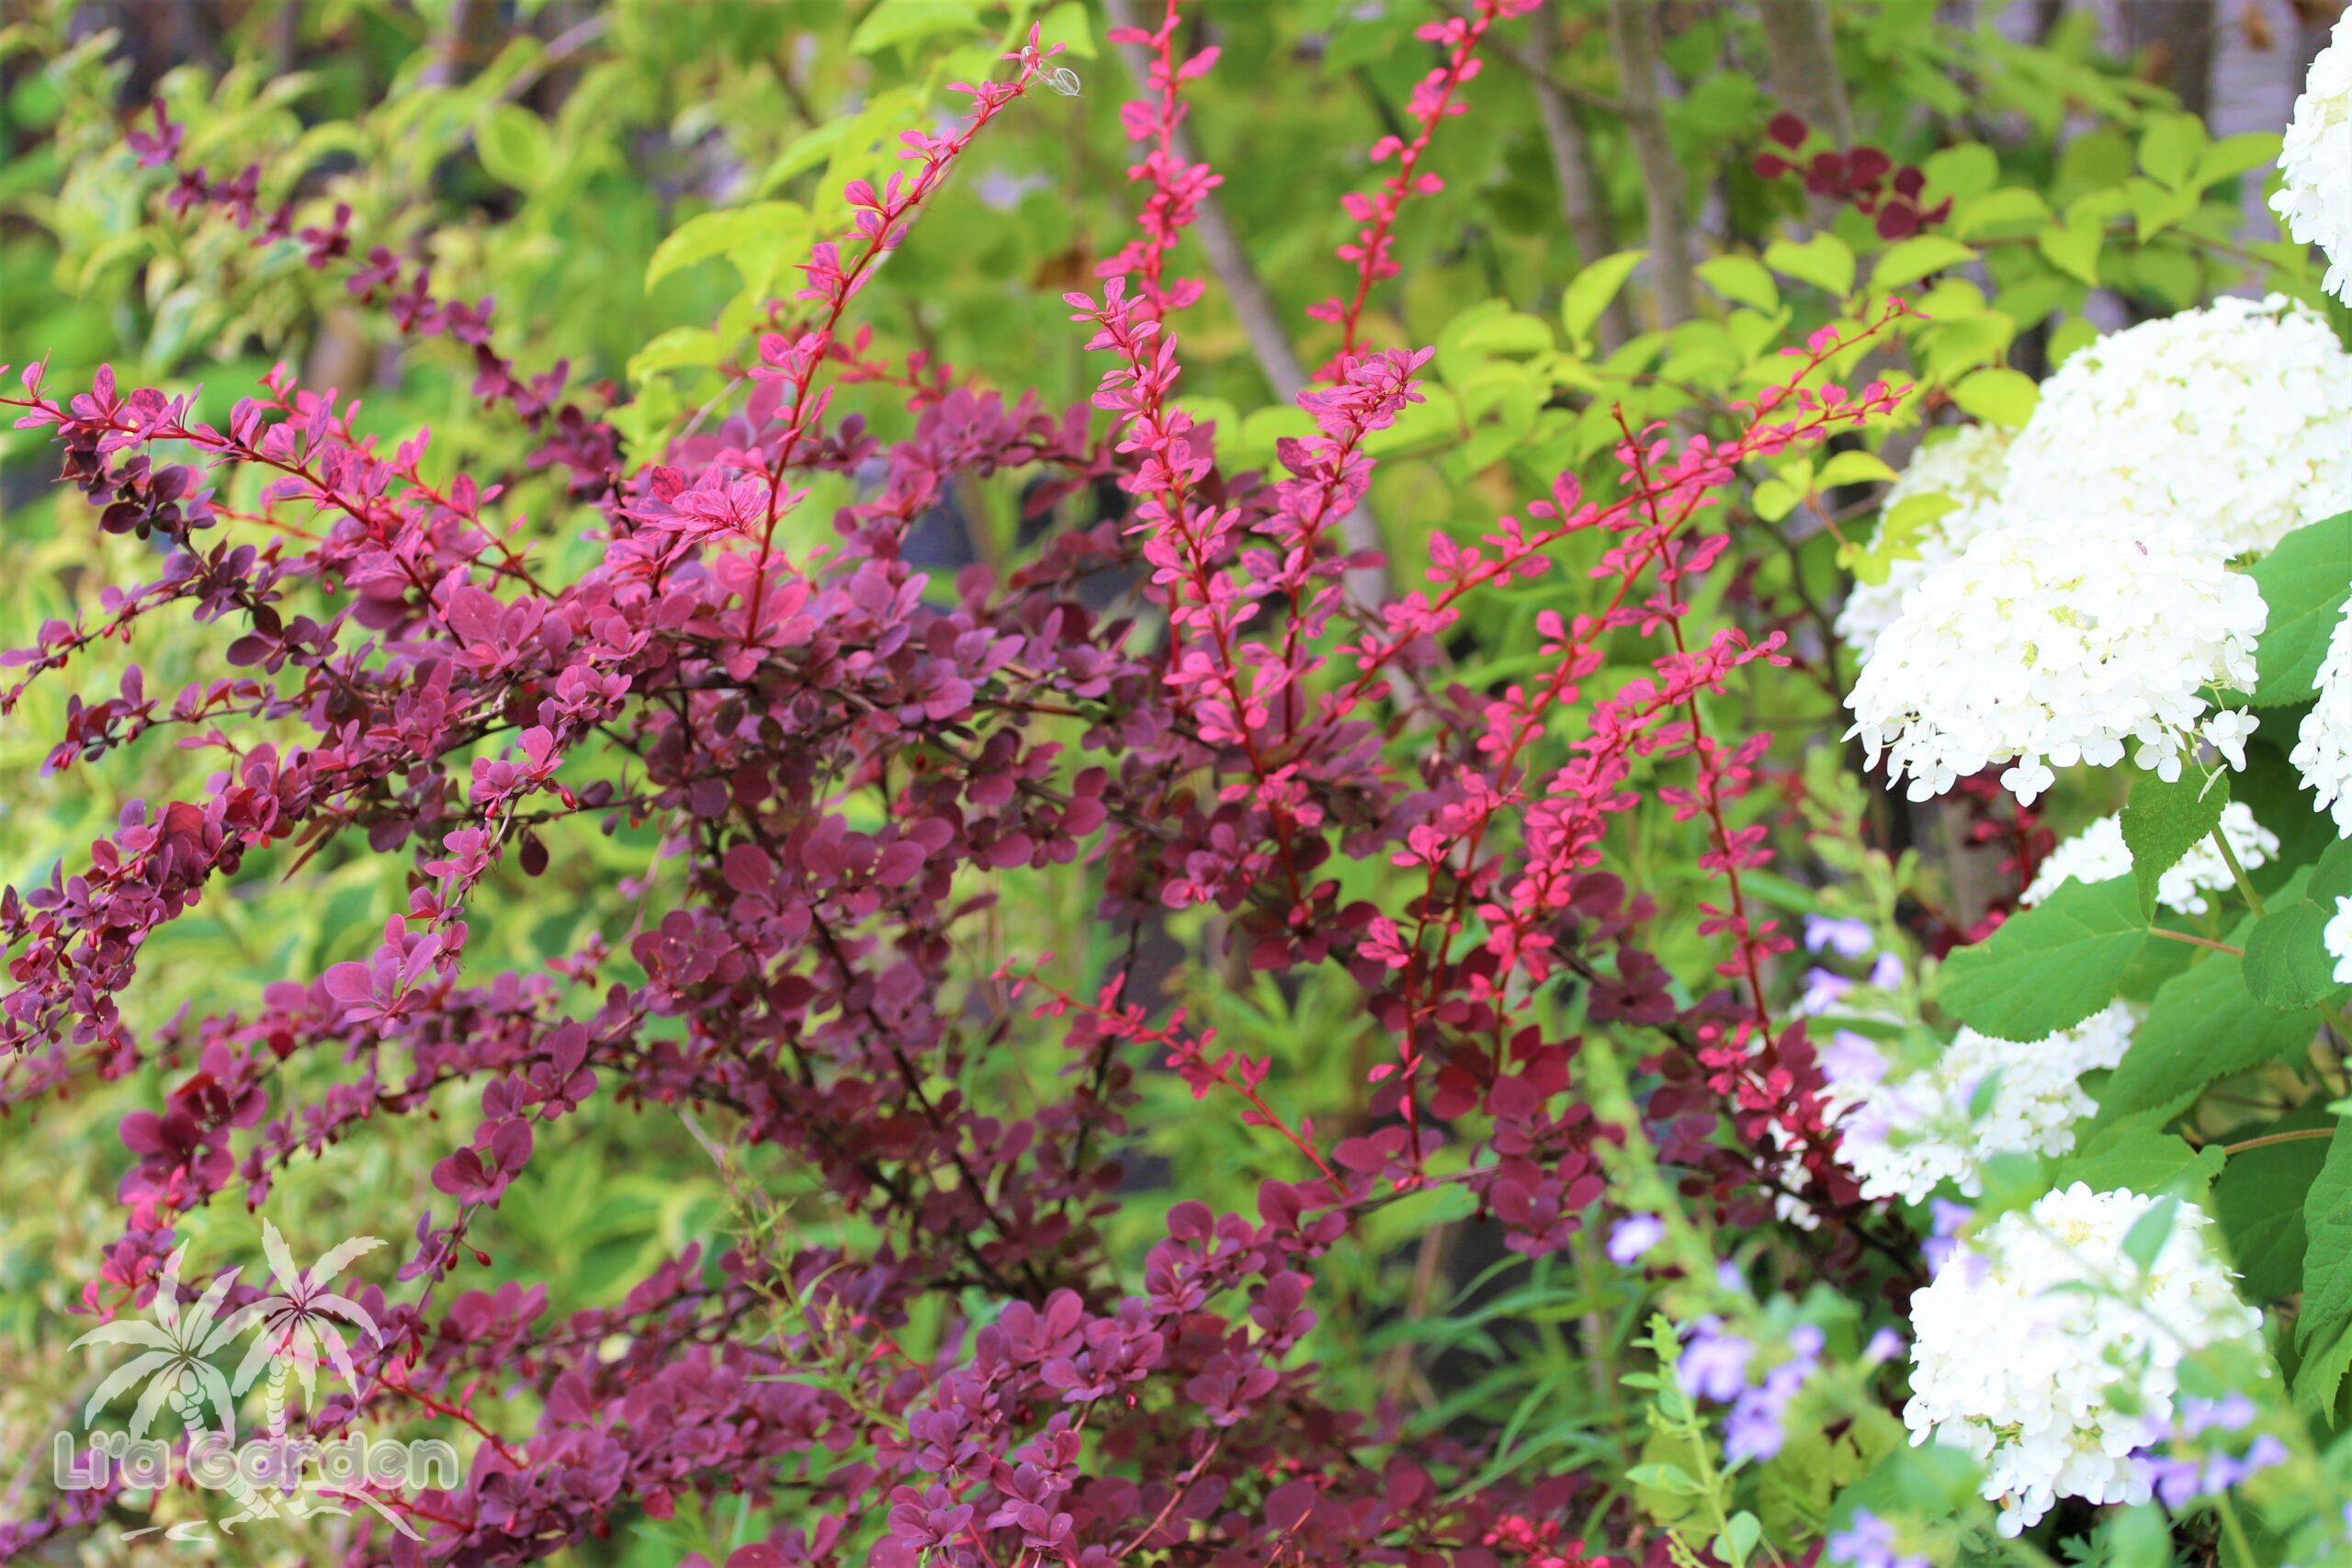 【低木】 メギ Berberis thunbergii 〈落葉広葉樹〉